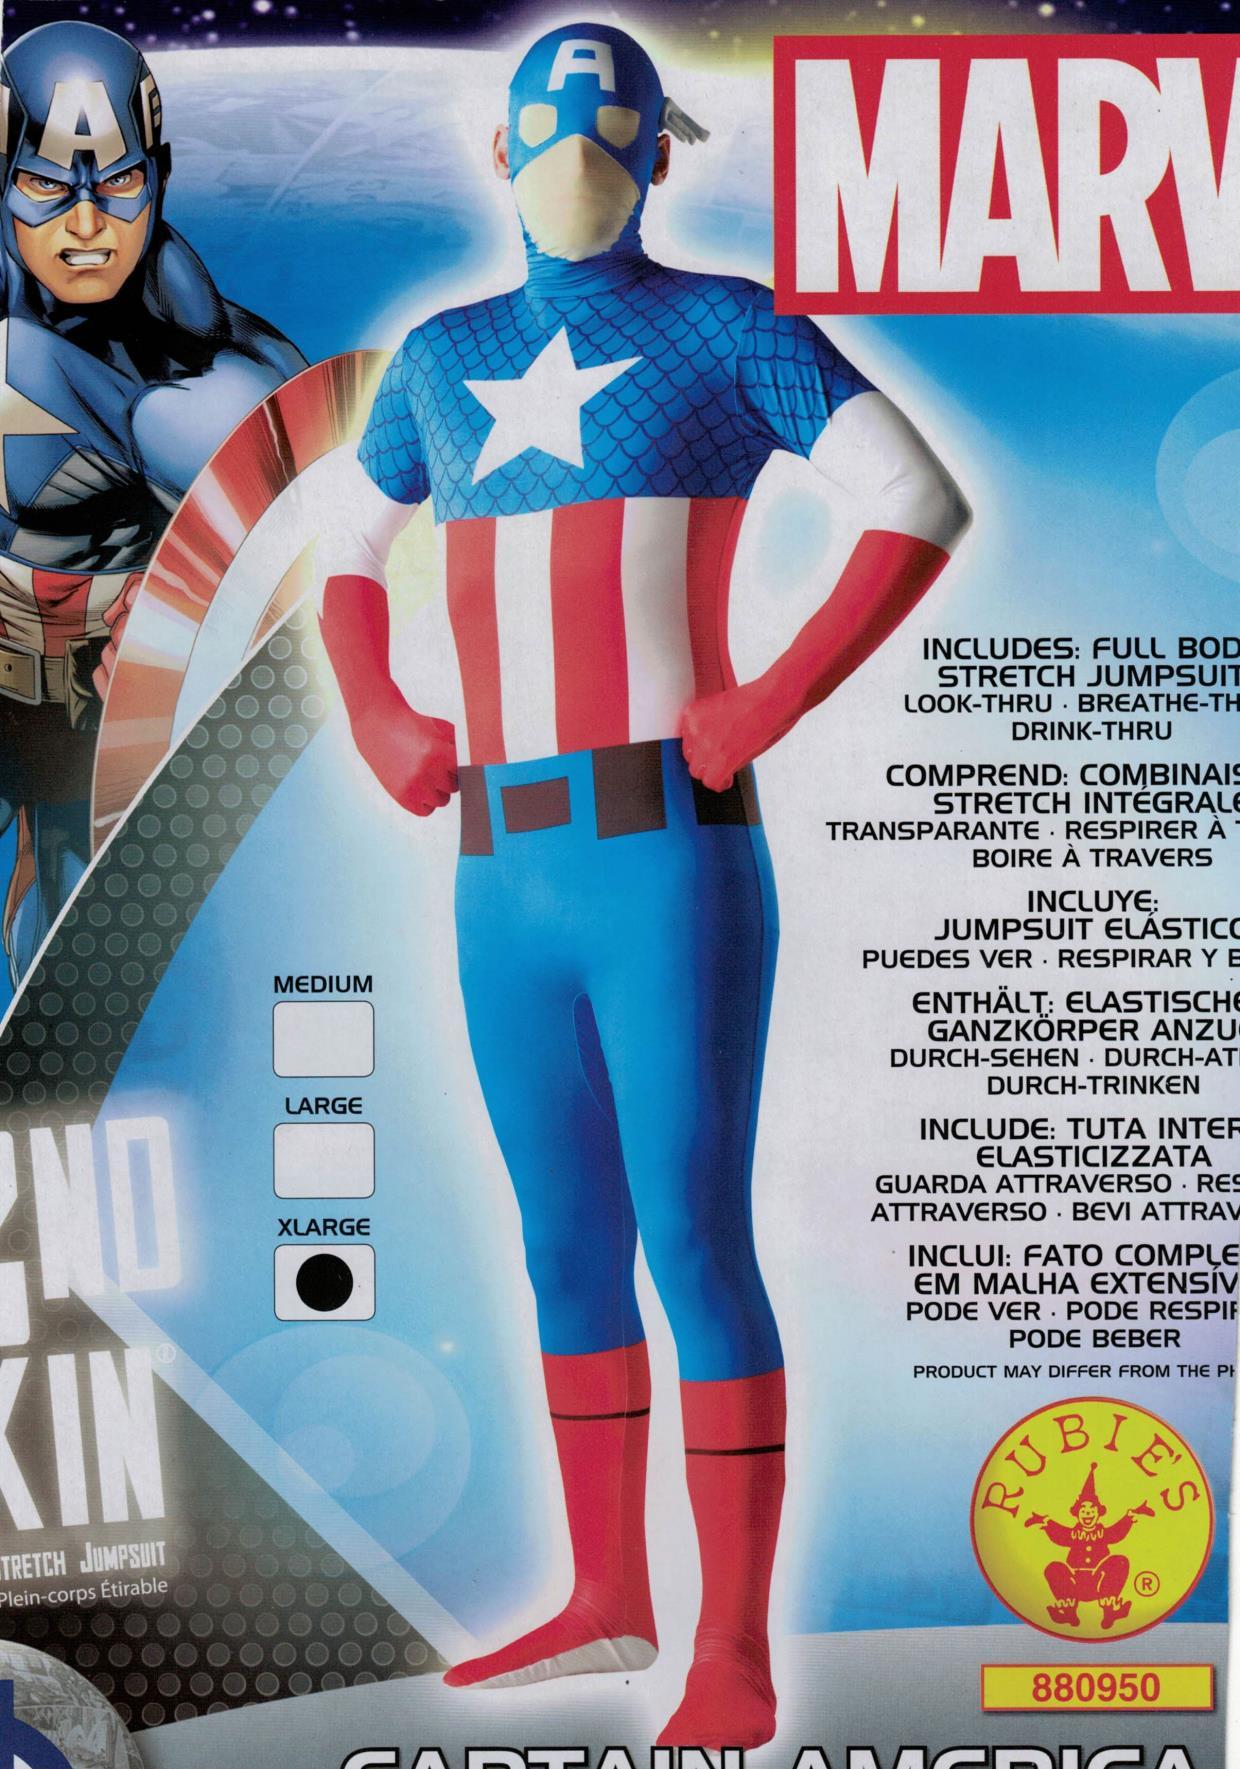 Noleggio vestiti da Supereroi Adulti UD | Noleggio vestiti da Supereroi Adulti PN | Noleggio vestiti da Supereroi Adulti San Vito al Tagliamento